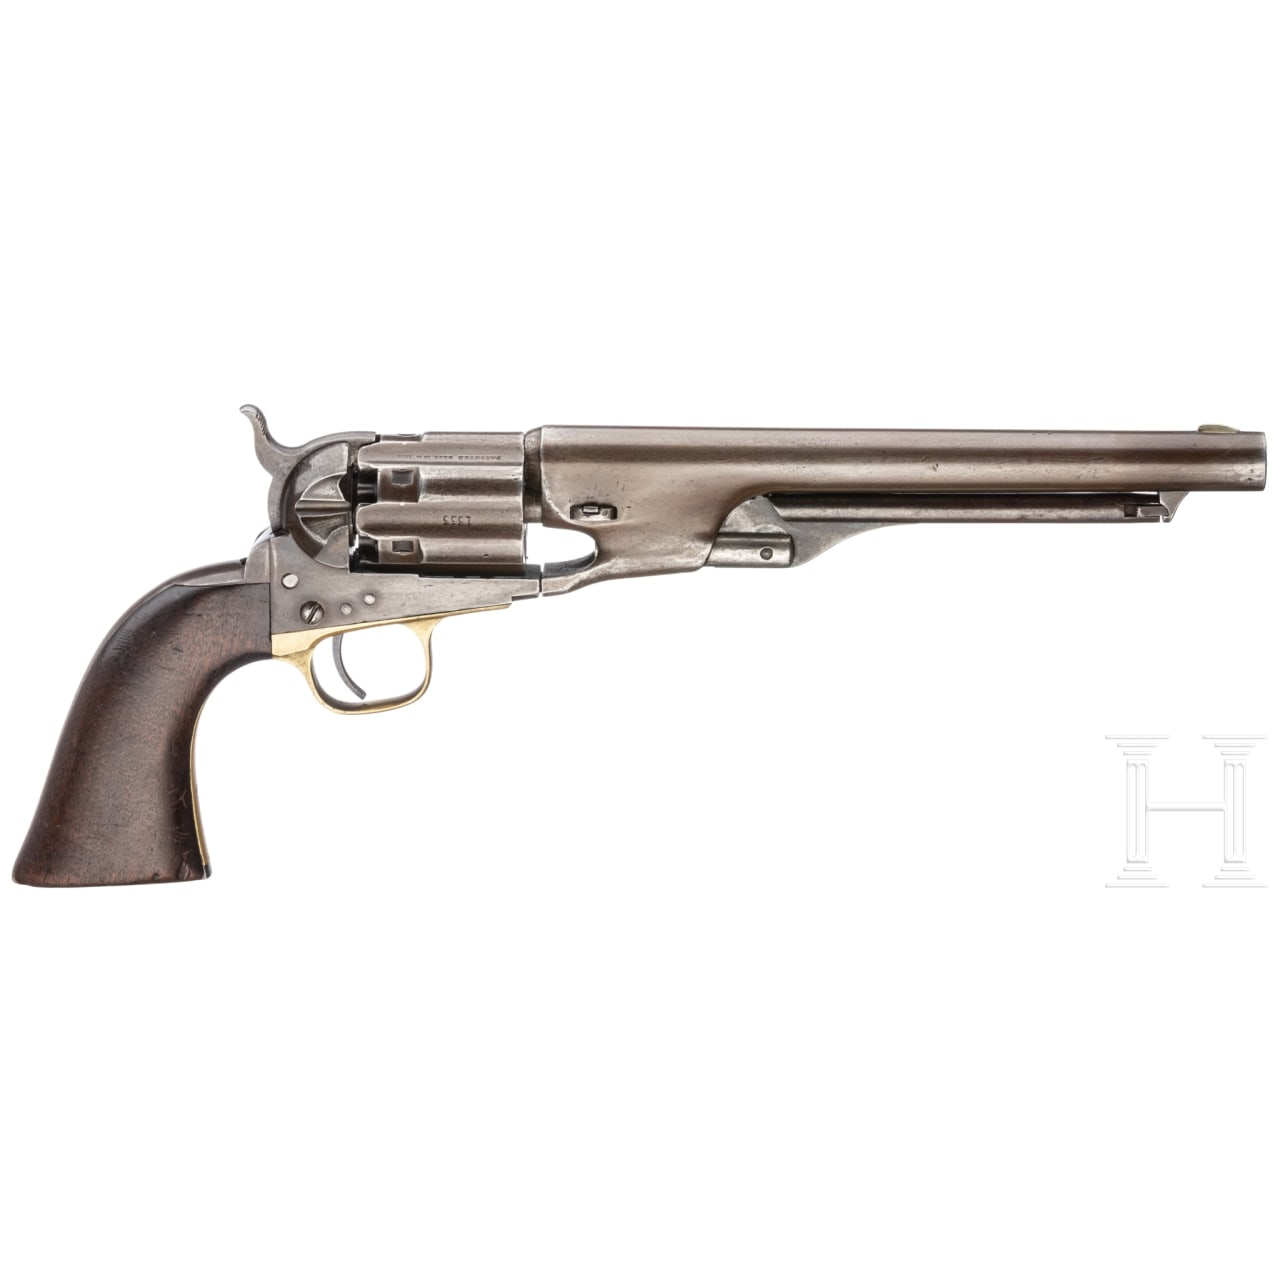 Colt Mod. 1860 Army